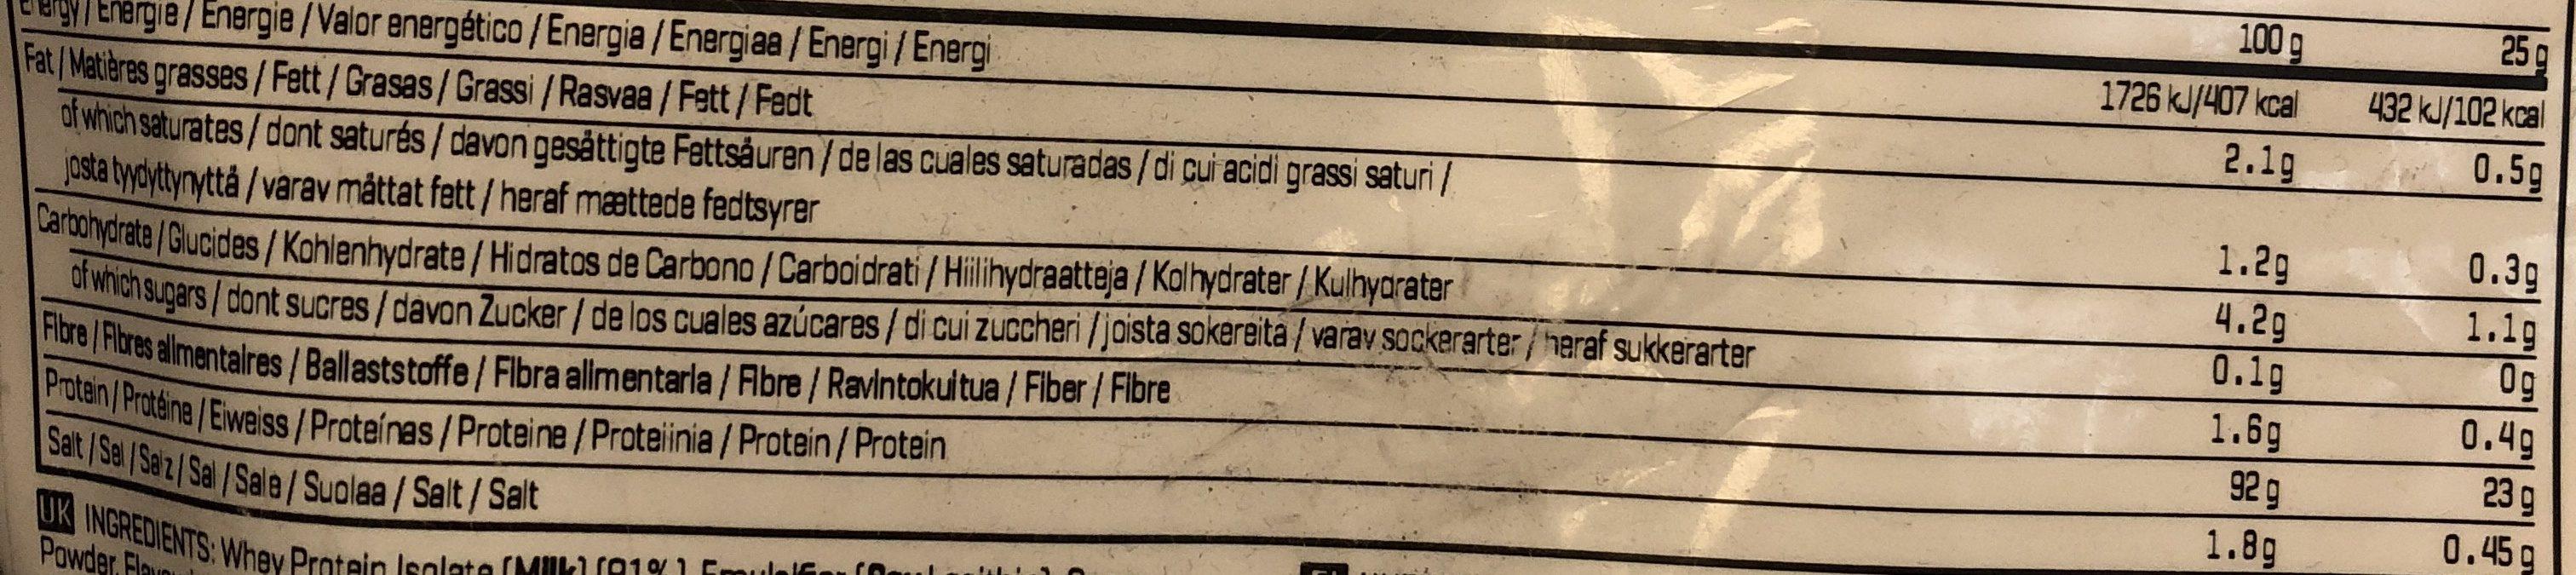 Iso:pro 97 - Chocolate - 2500G - Ingrediënten